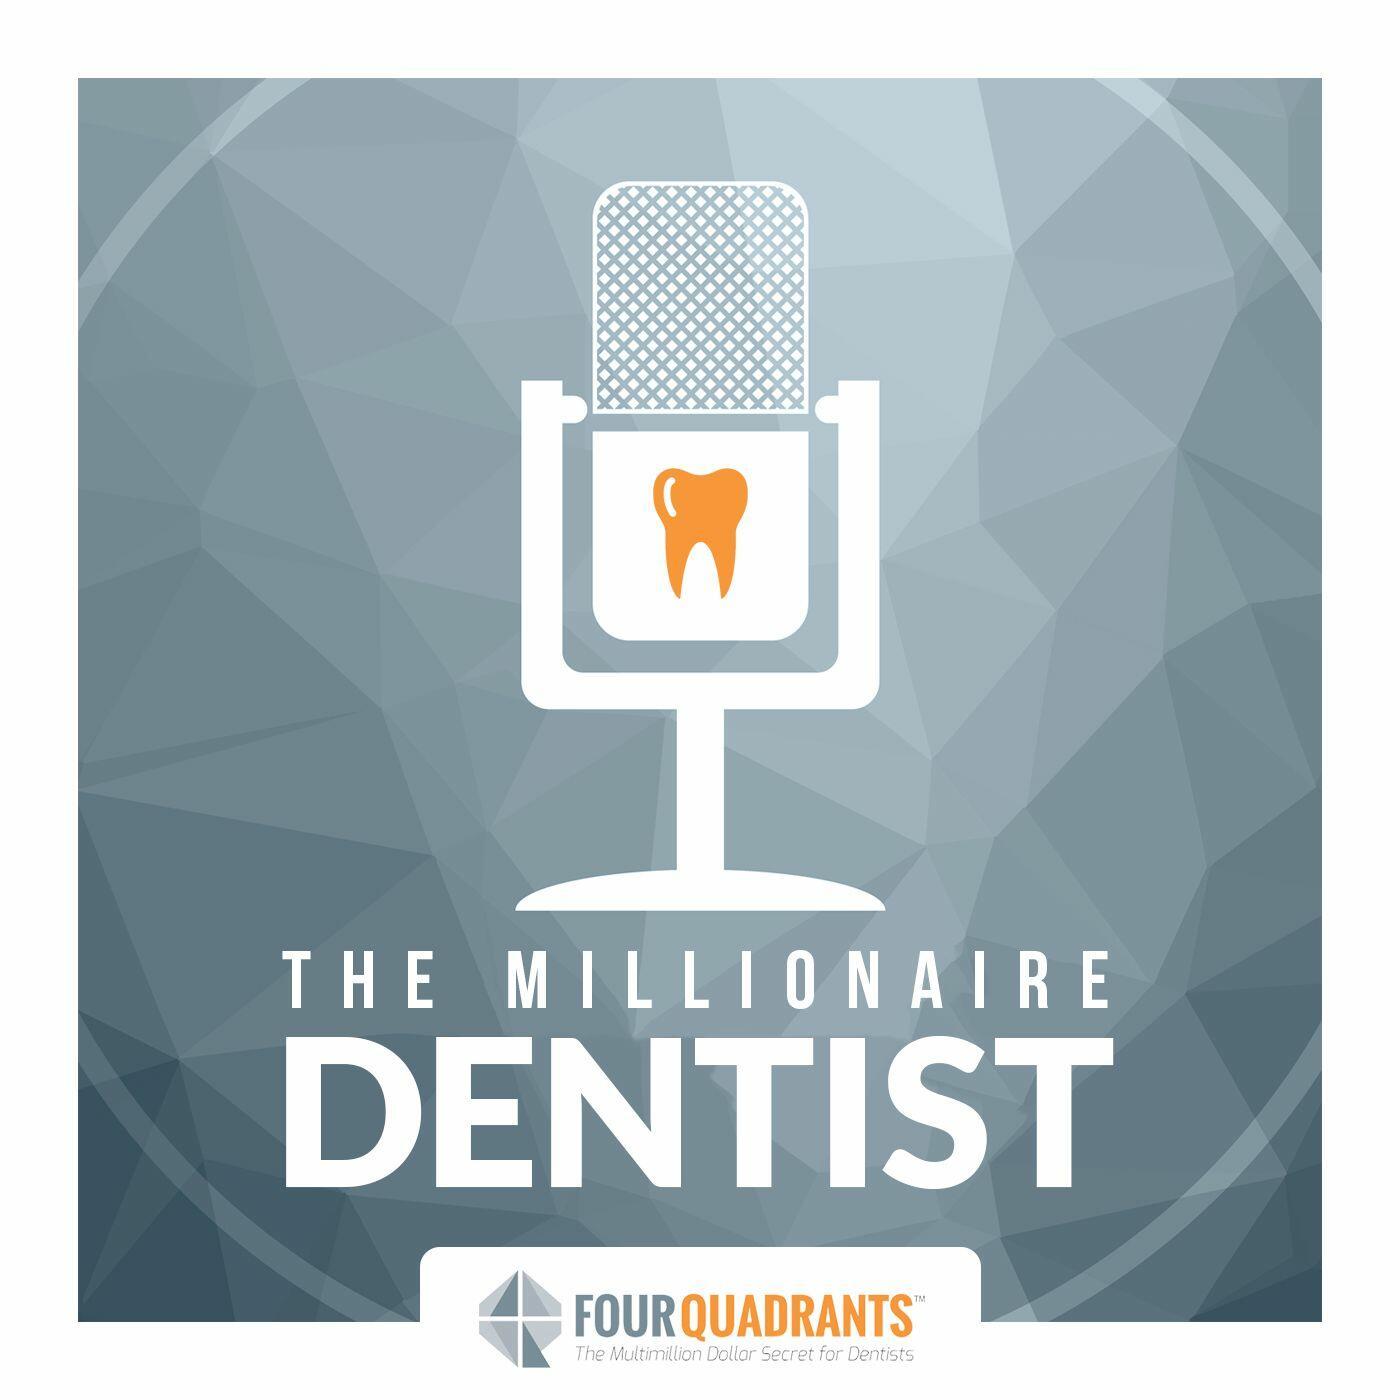 The Millionaire Dentist